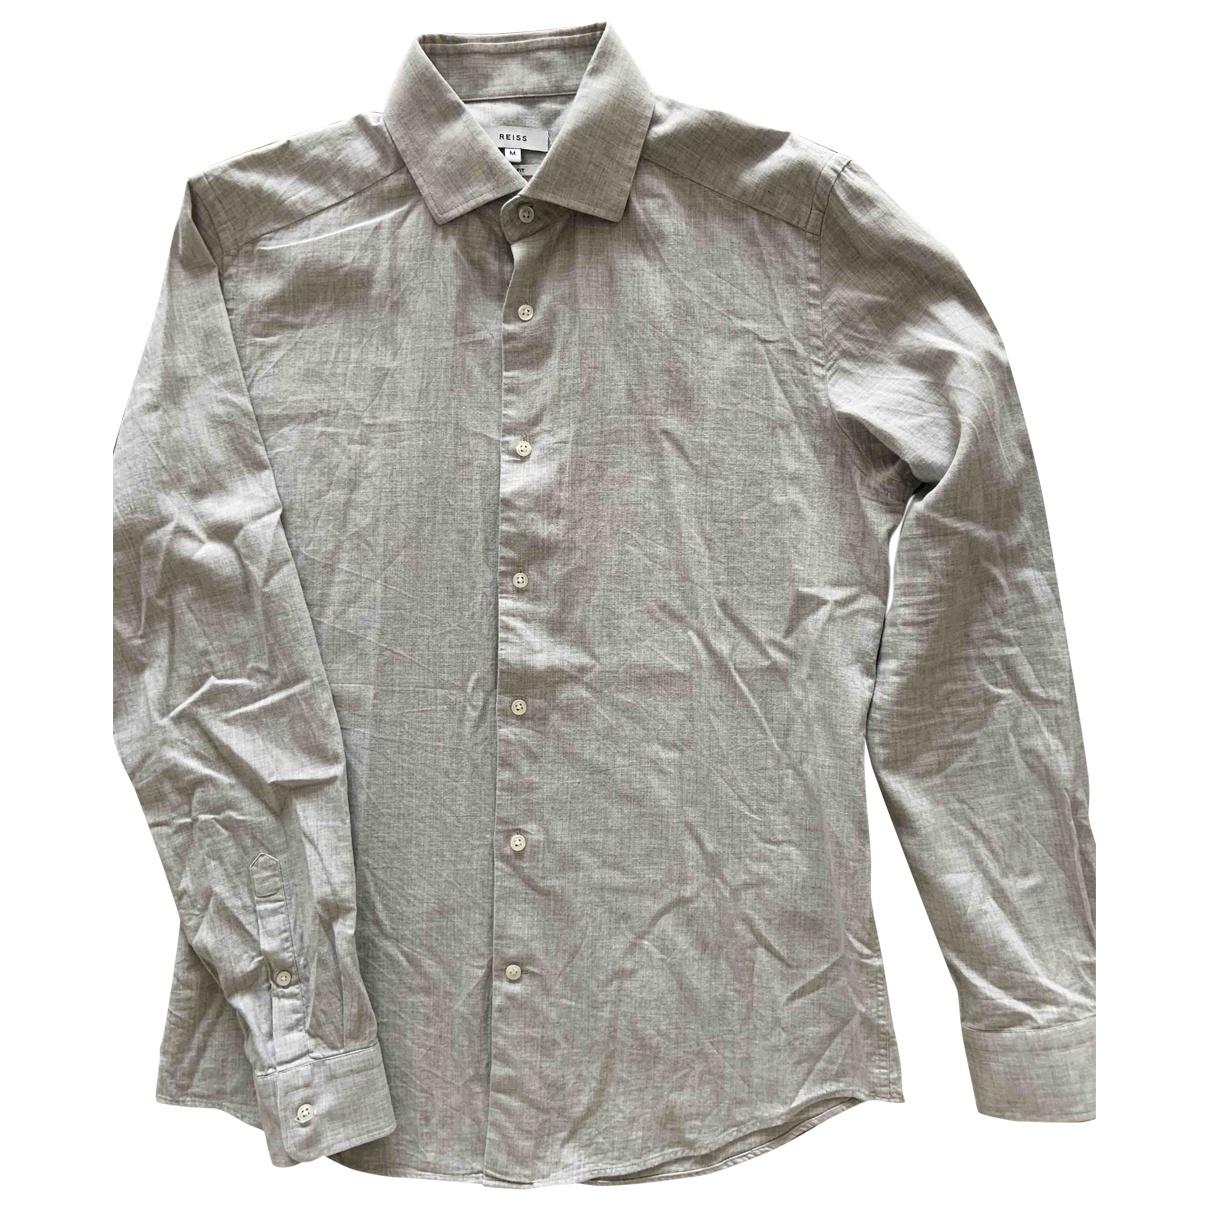 Reiss \N Grey Cotton Shirts for Men M International